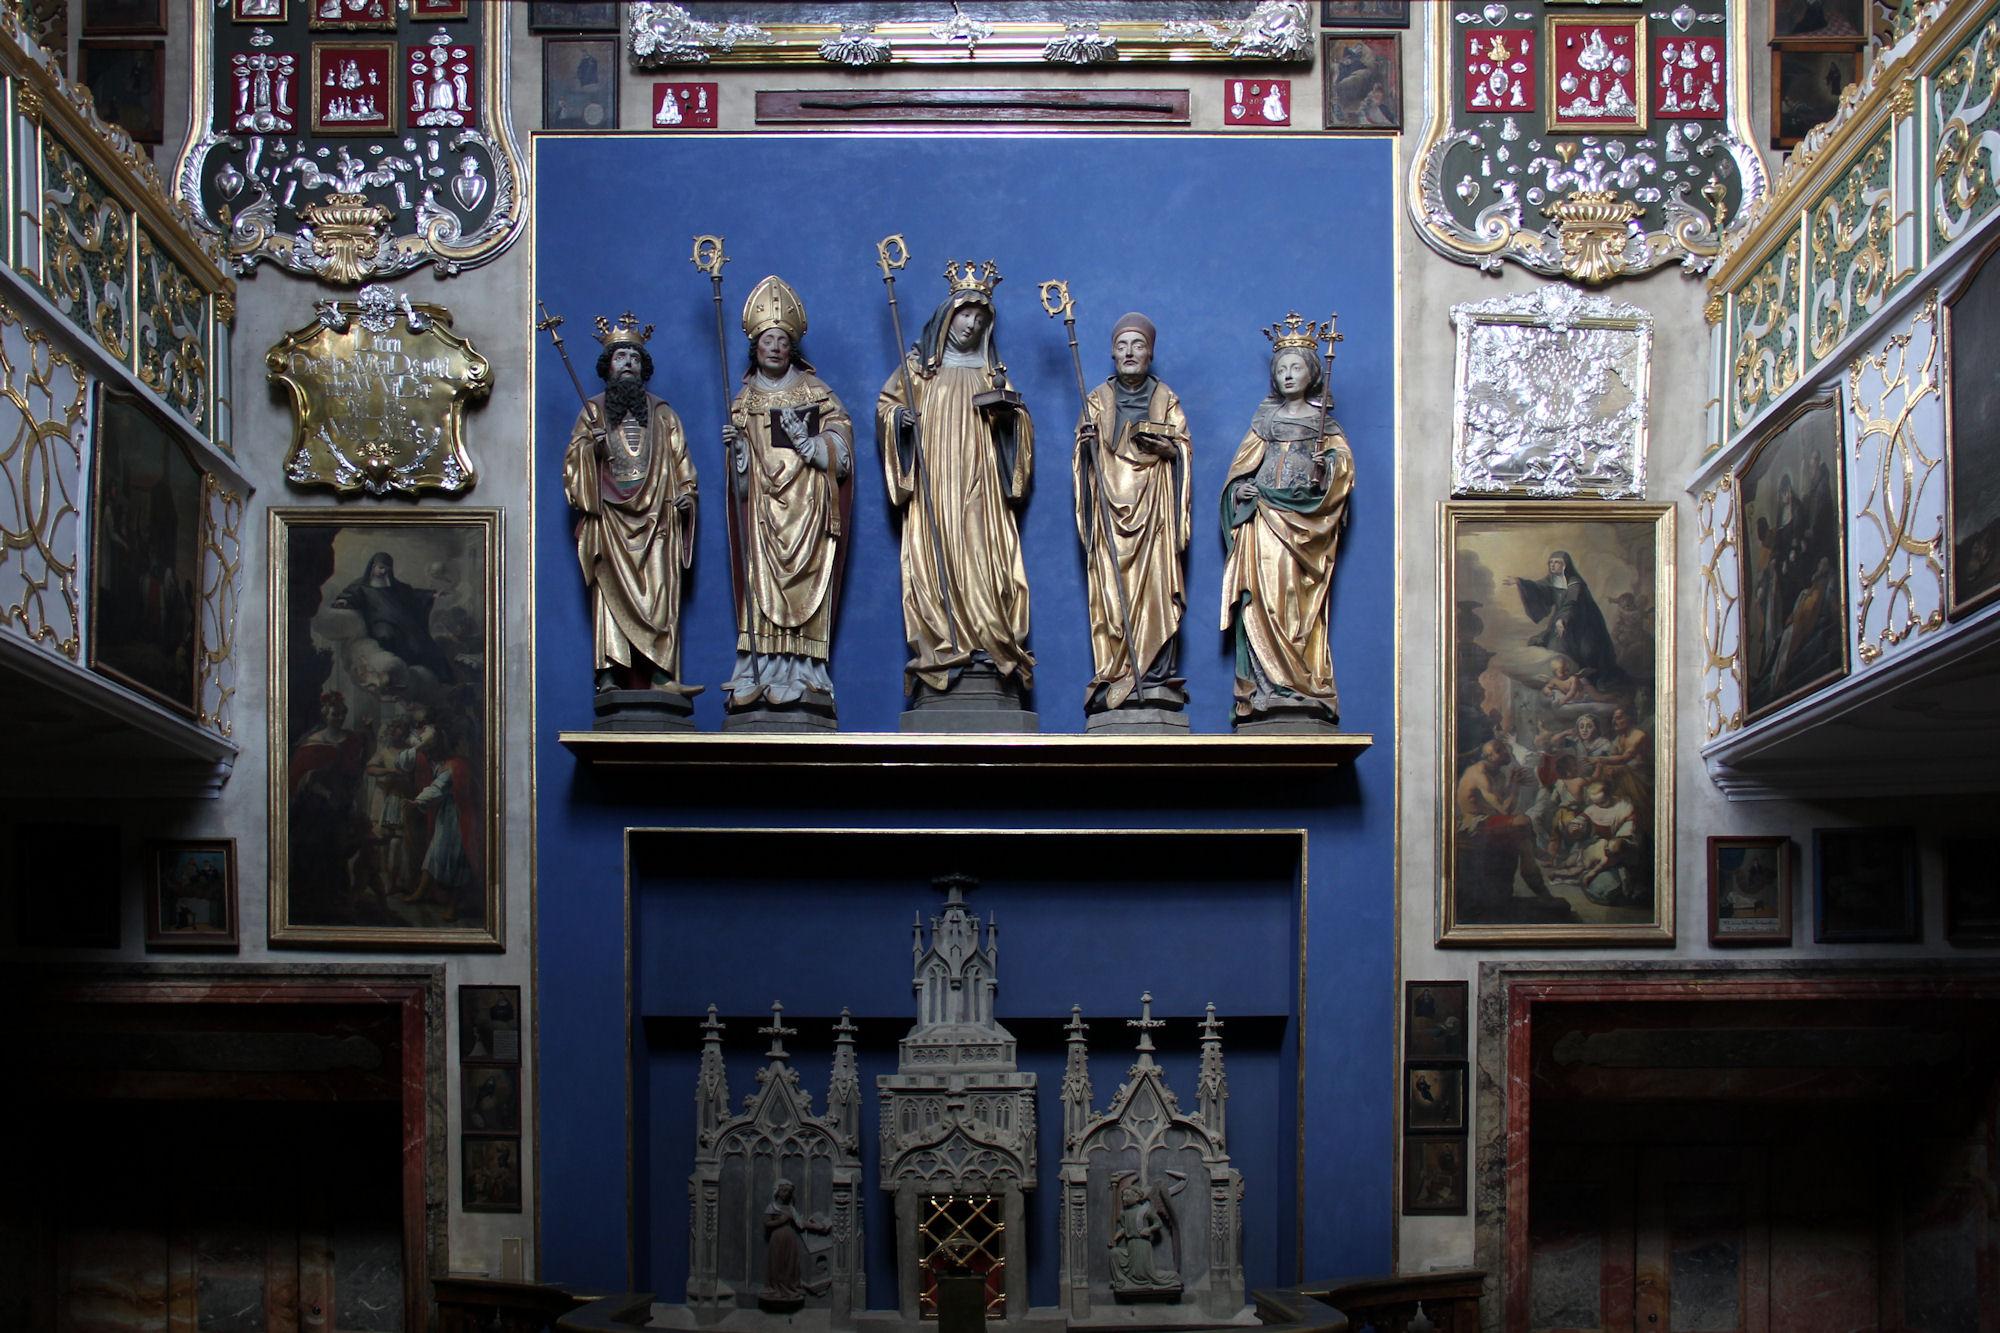 https://upload.wikimedia.org/wikipedia/commons/0/06/Eichst%C3%A4tt%2C_Kloster_St_Walburg_36-Crypt.JPG